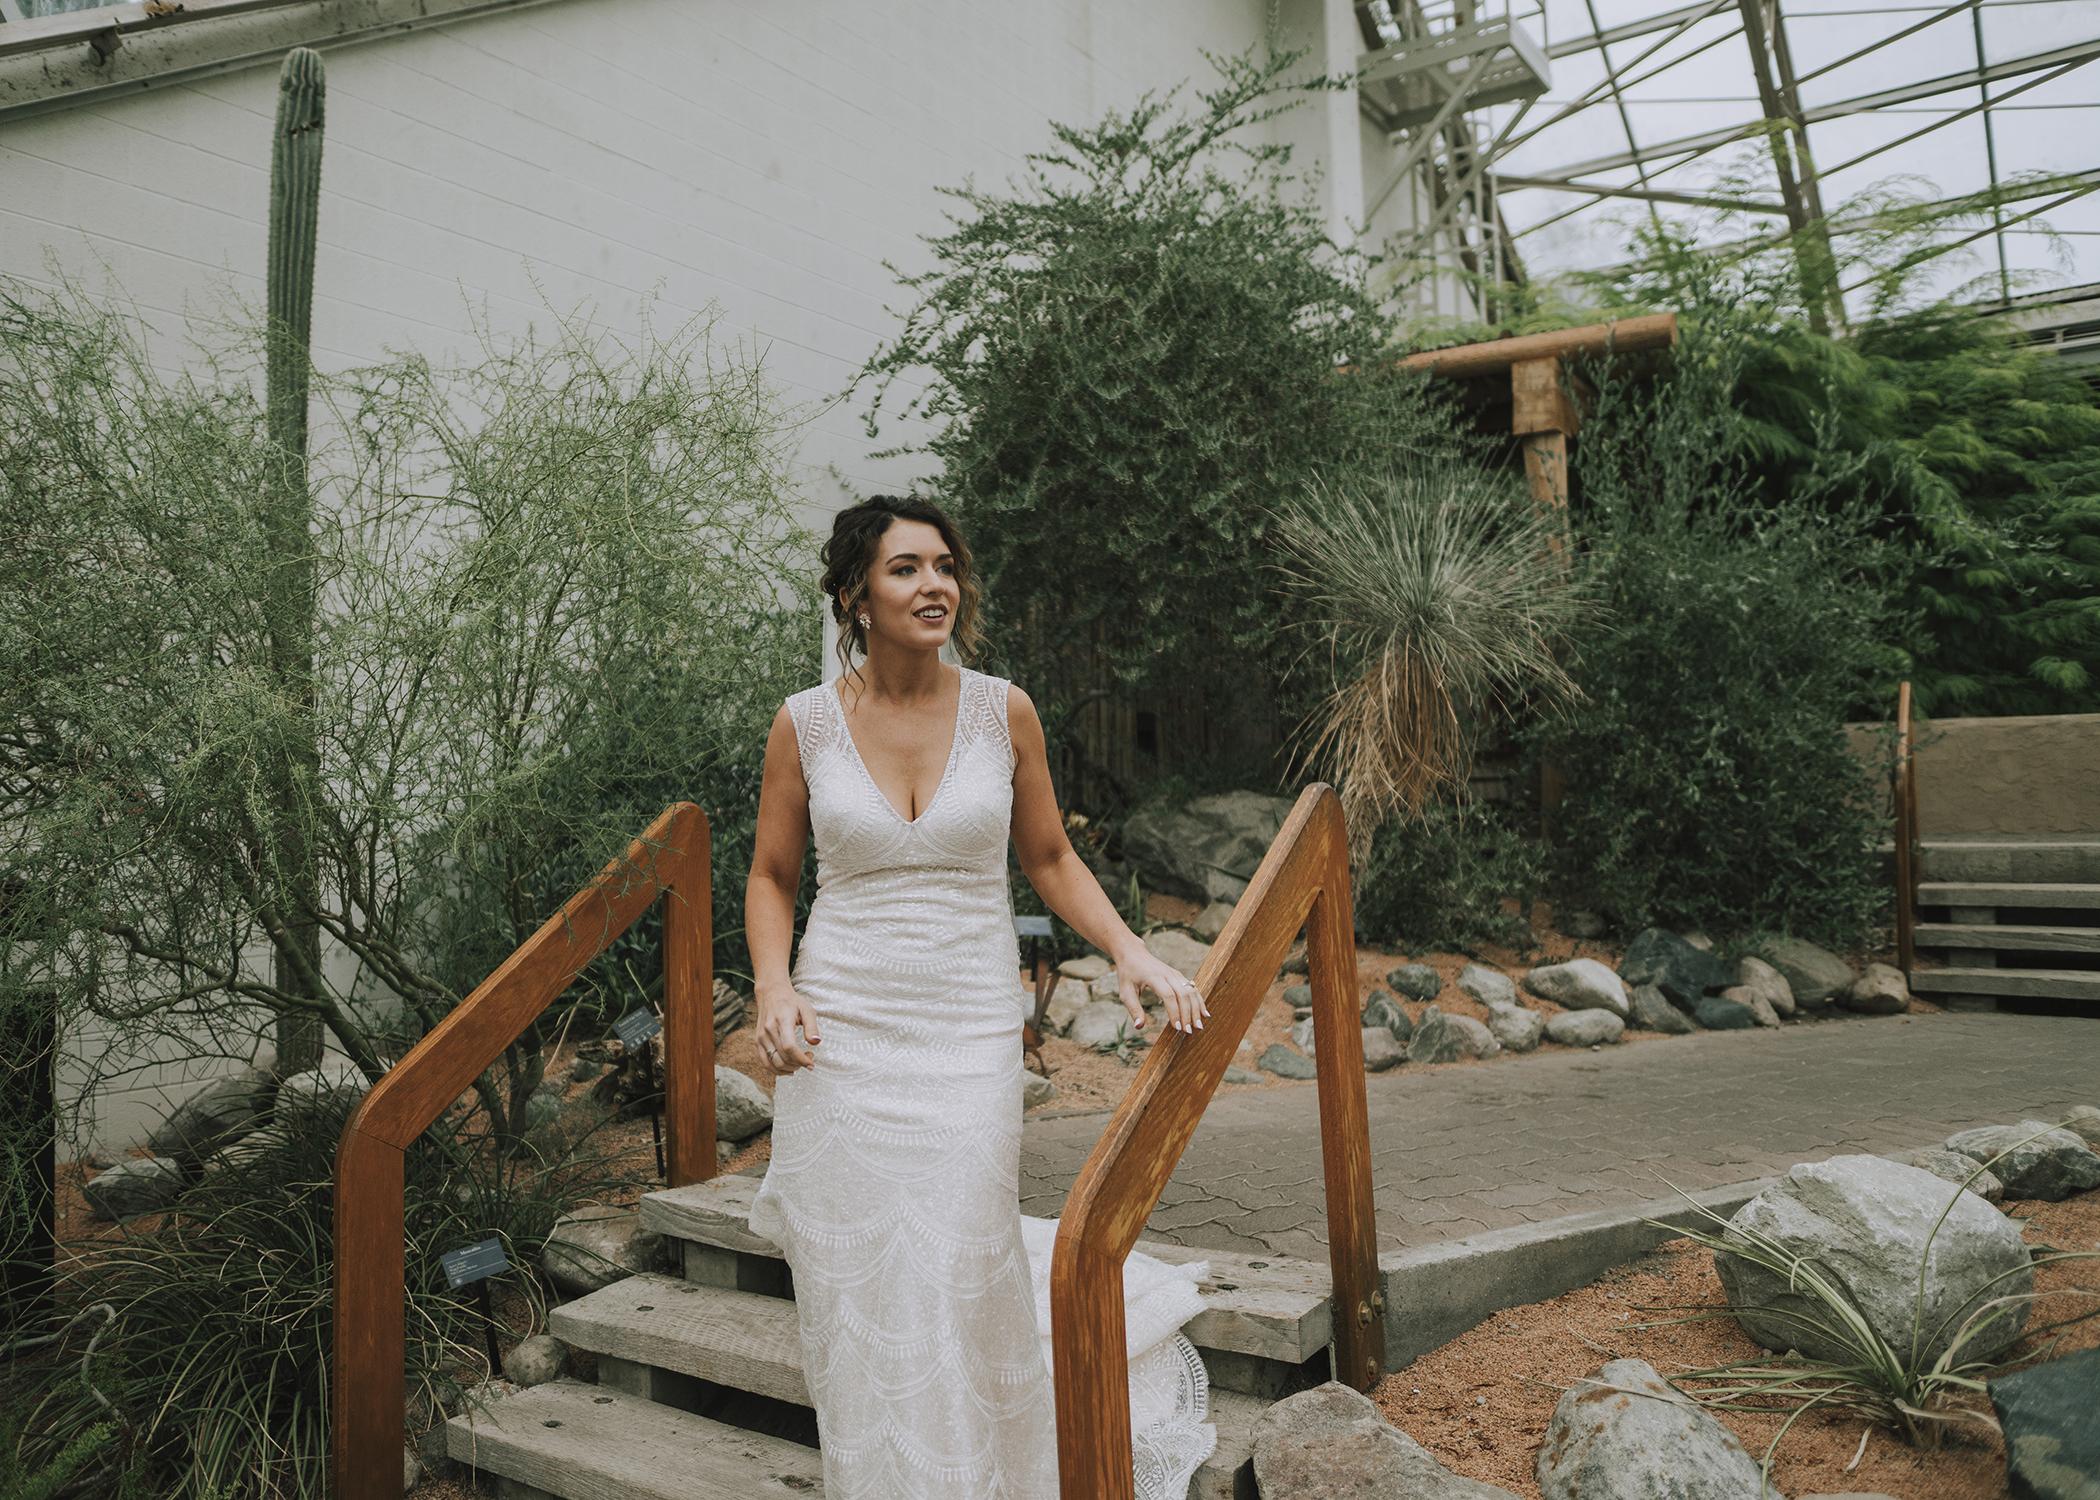 wedding dress bride hannah bergman photography indianapolis Foellinger-Freimann Botanical Conservatory